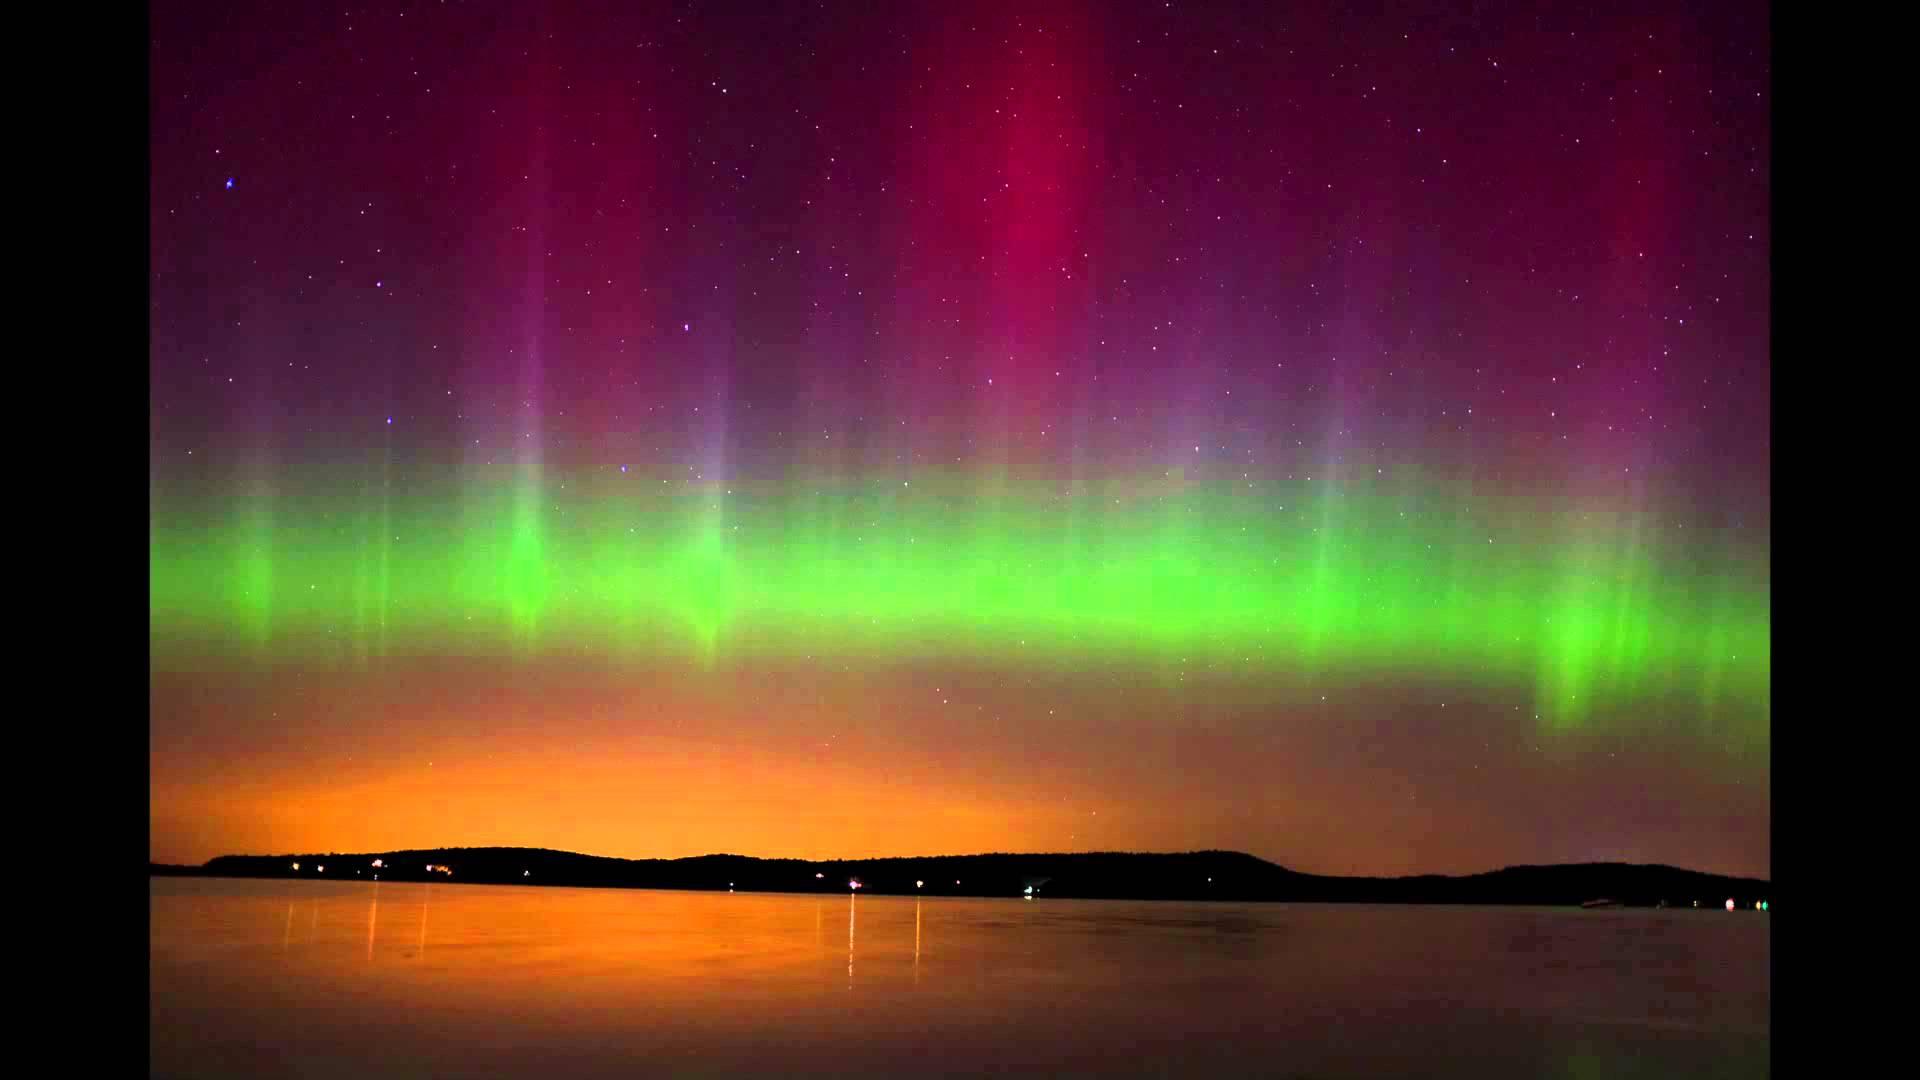 Northern Lights (Aurora Borealis) in Malletts Bay, Vermont on 10/8/2013